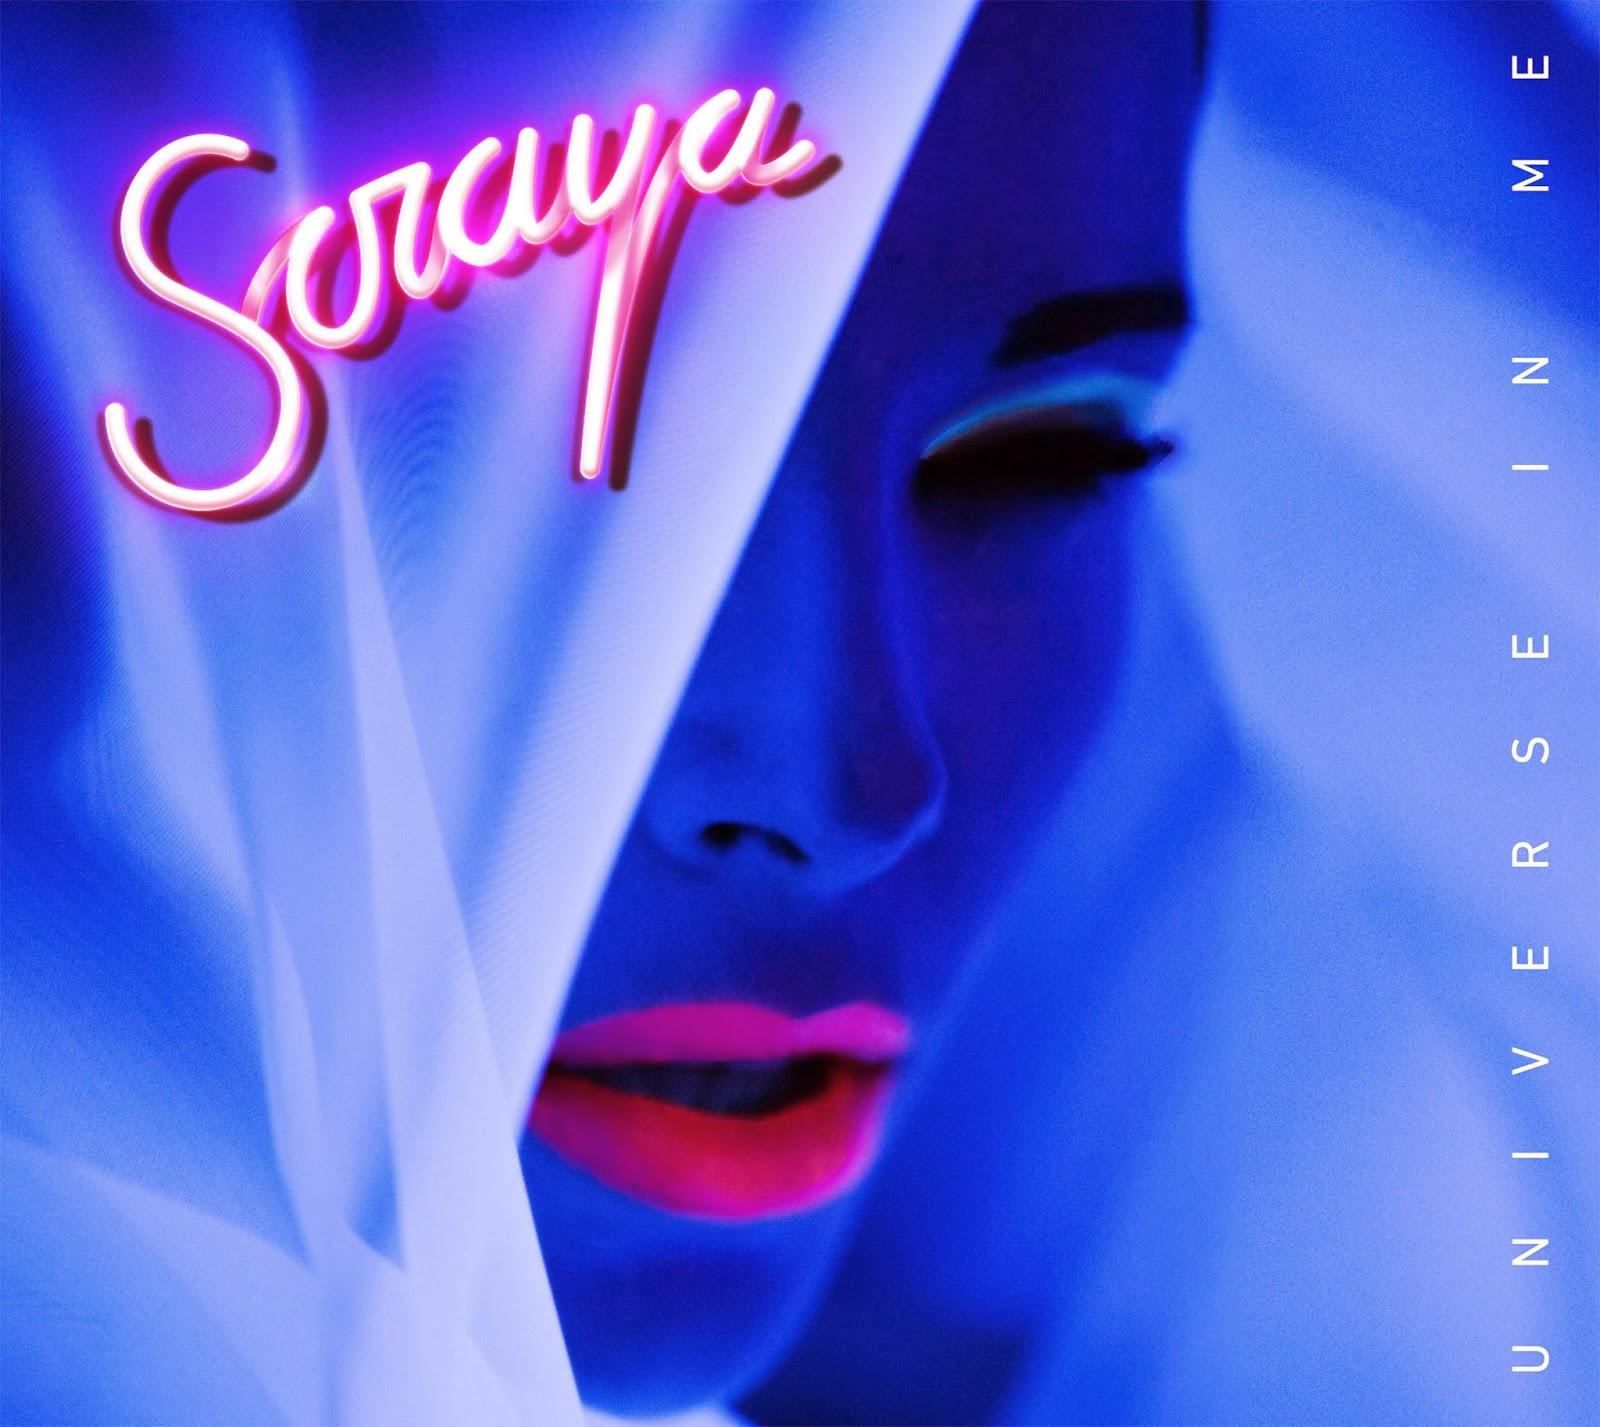 http://midolcevitablogs.blogspot.com.es/2013/12/universe-in-me-de-soraya-arnelas-opinion.html